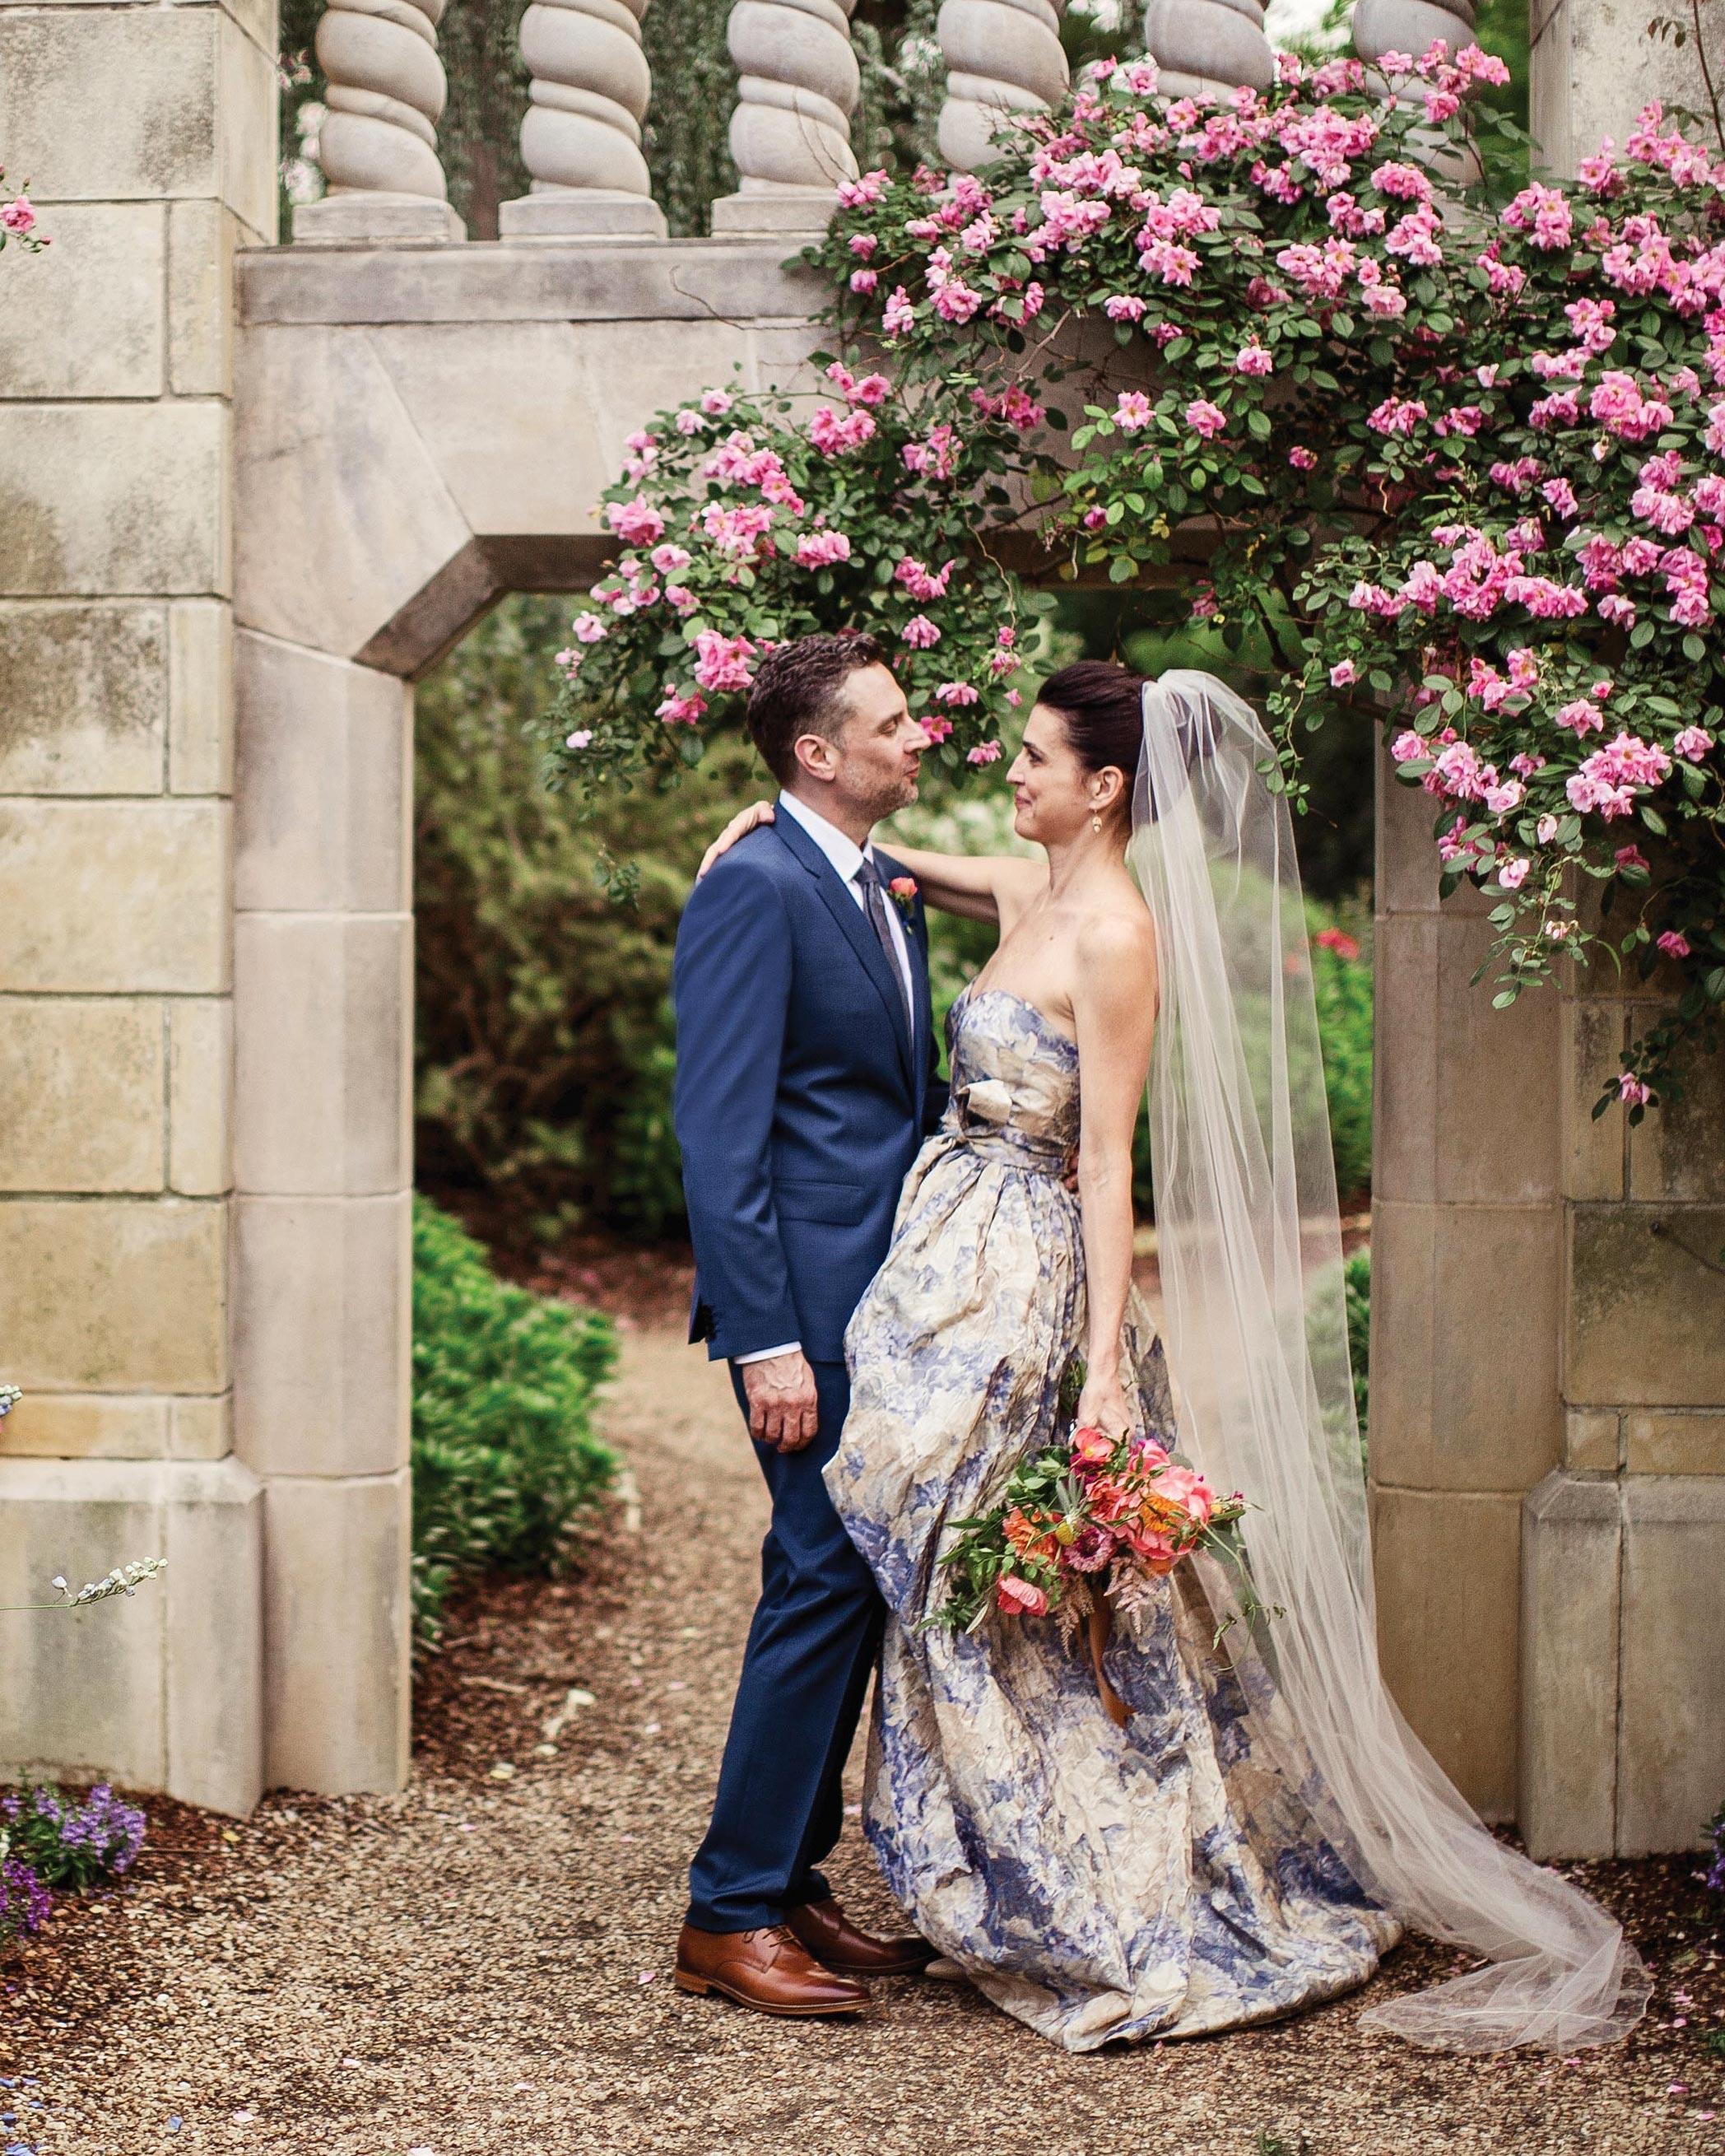 tara-dan-wedding-texas-couples-portrait-016-s112848.jpg